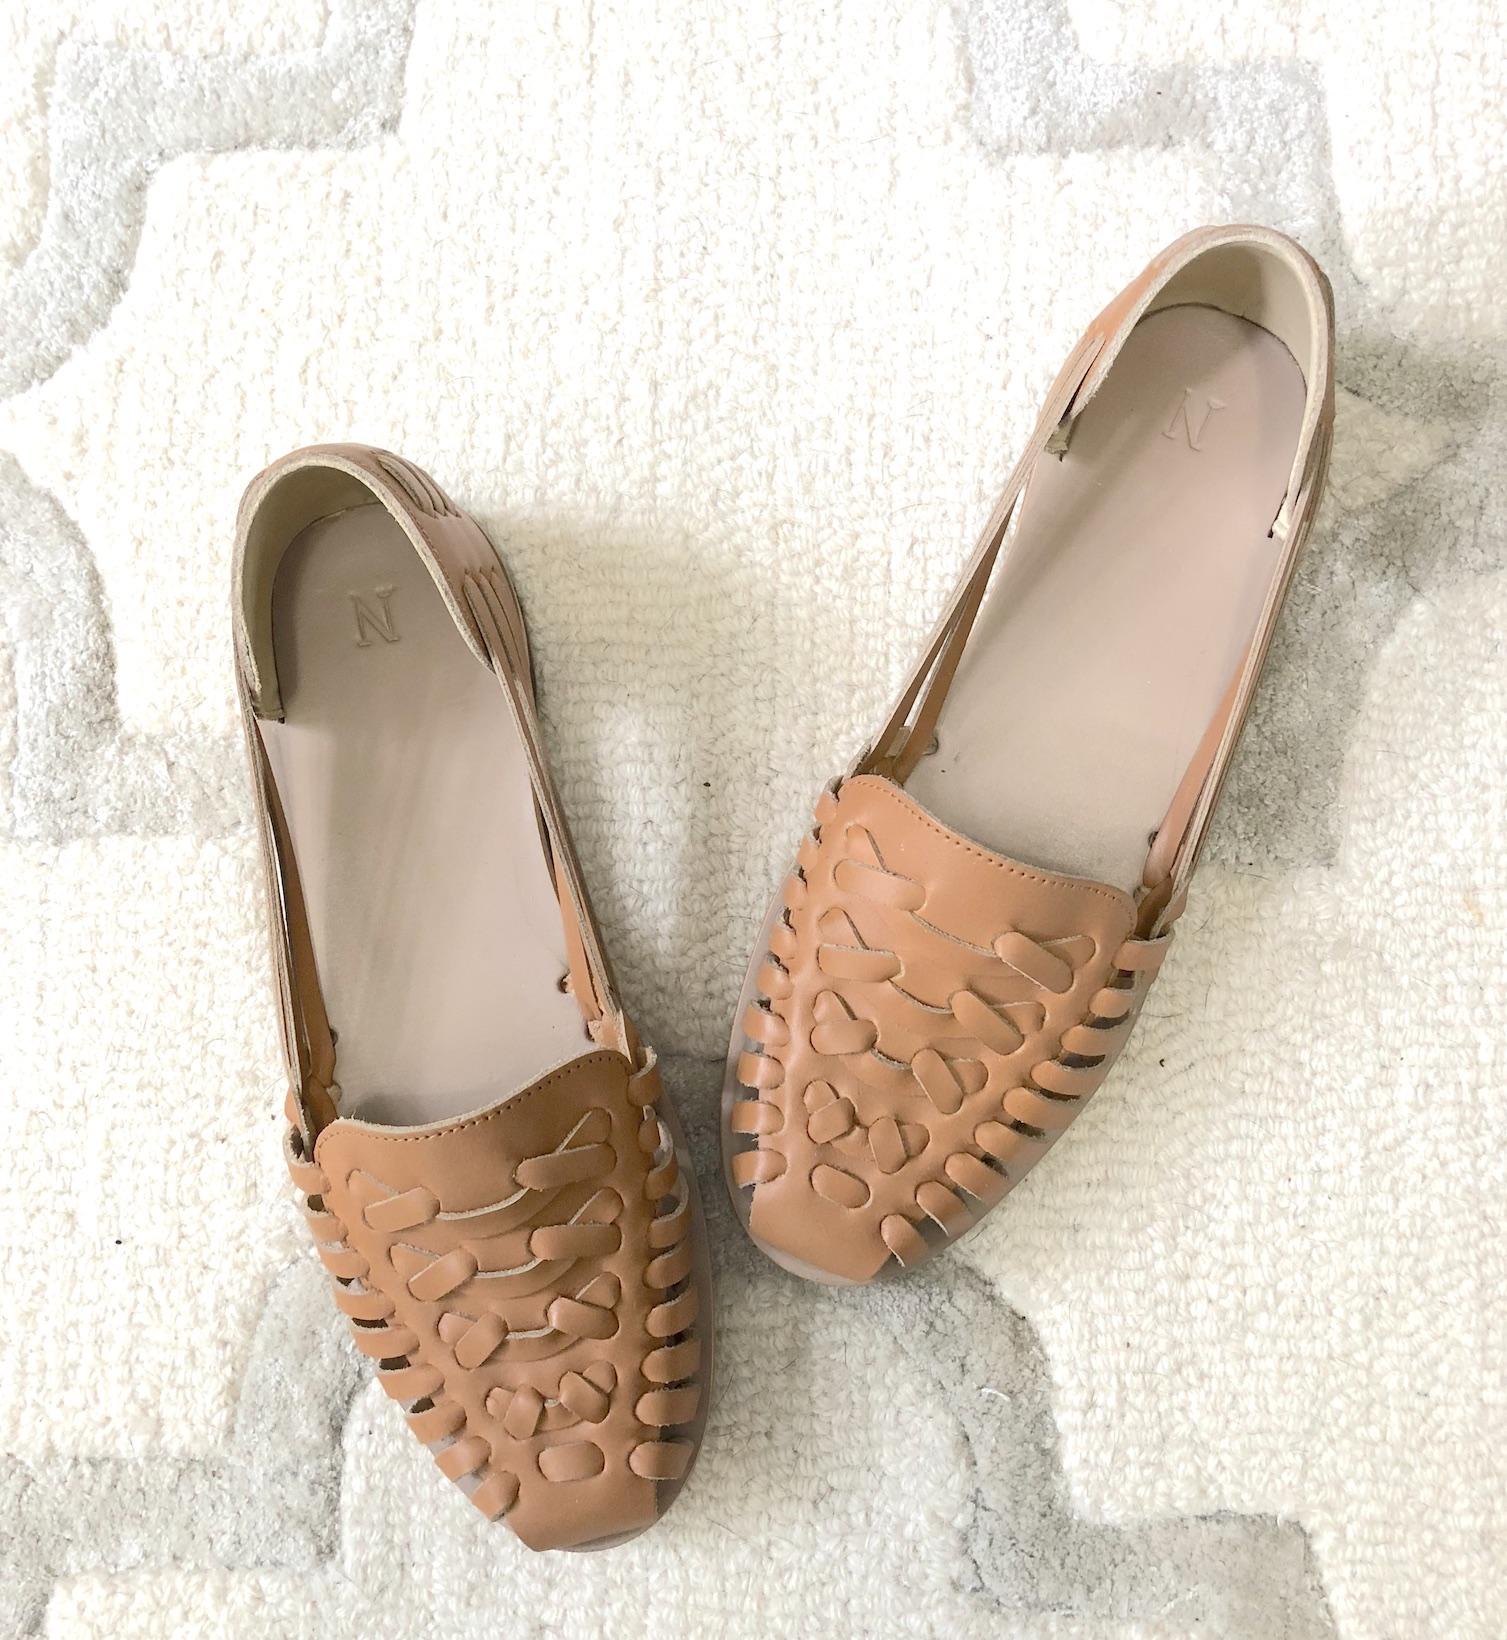 4538787a6810 My Favorite Summer Shoes - Nisolo Ecuador Huarache Sandal